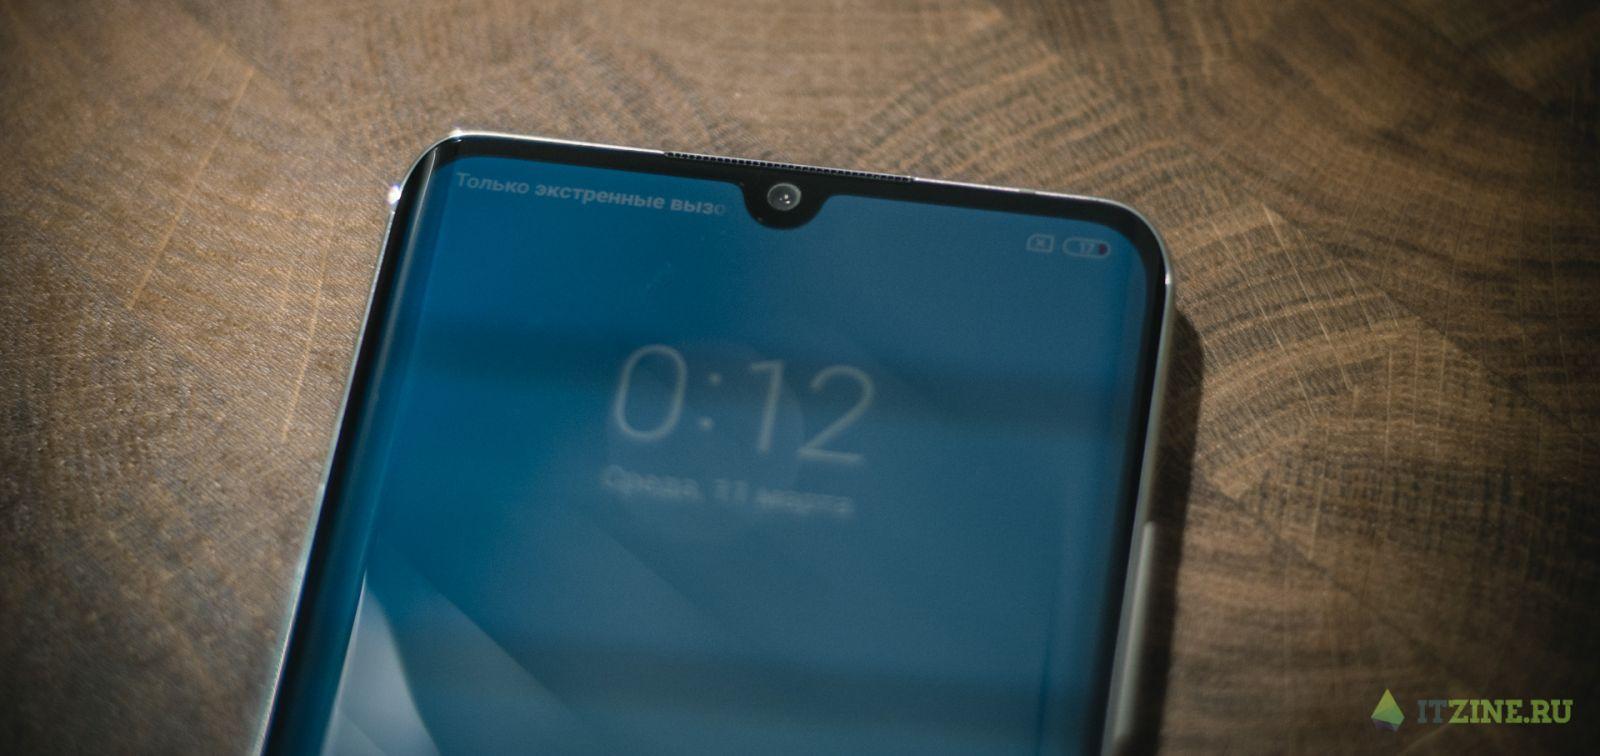 Обзор Xiaomi Mi Note 10 Pro. Добротный флагман (dsc 8100)